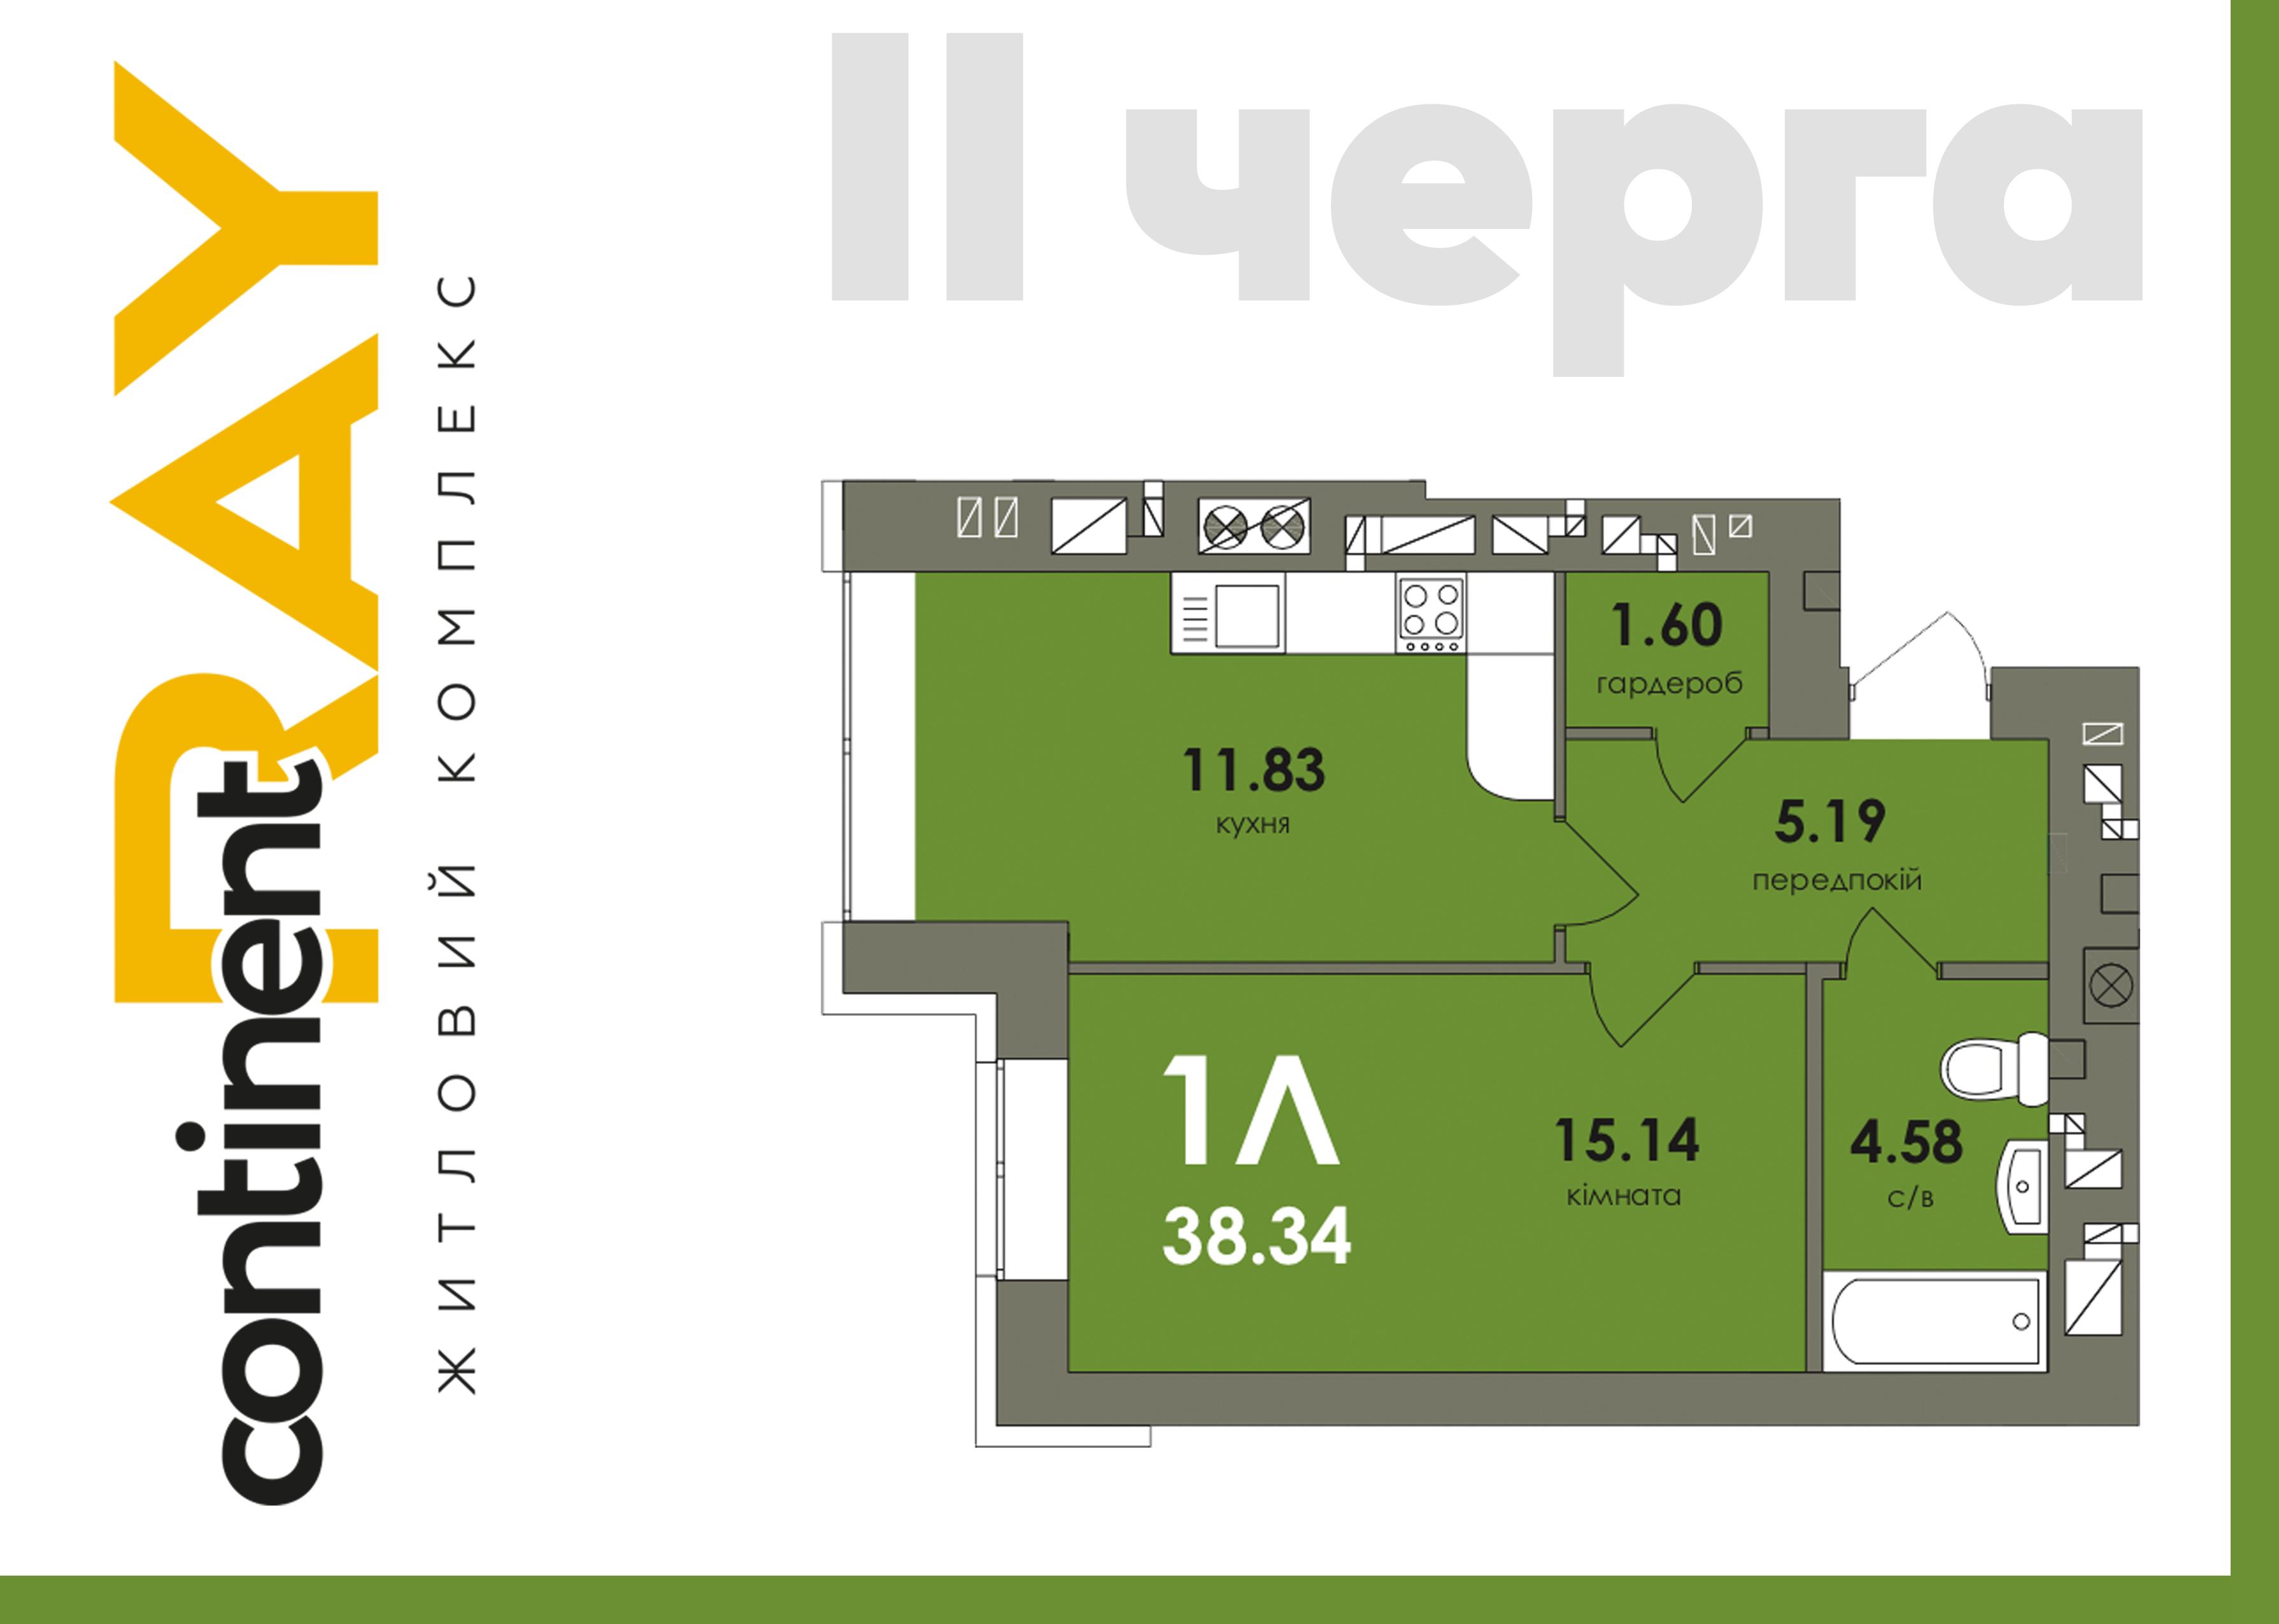 1-кімн. кв 1Л 38.34 м²